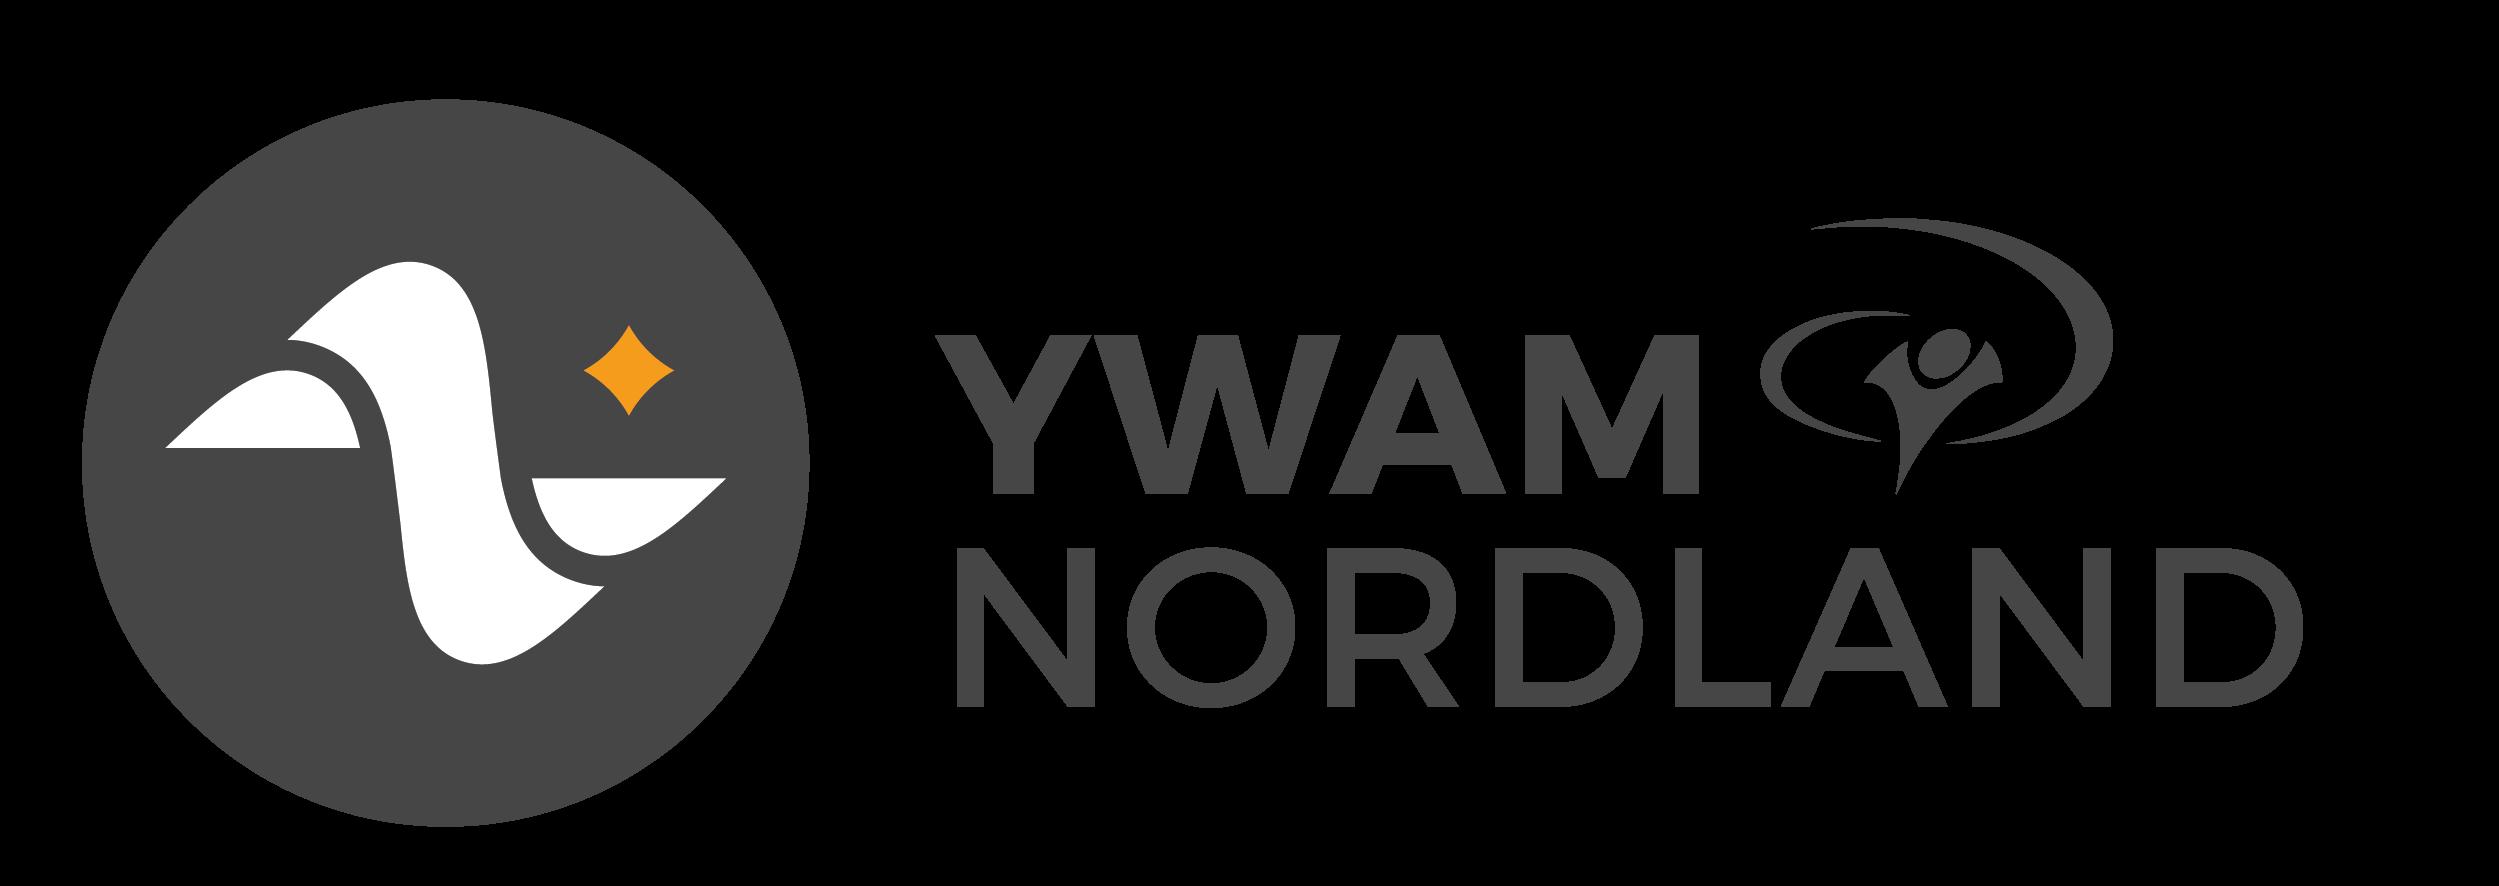 YWAM Nordland